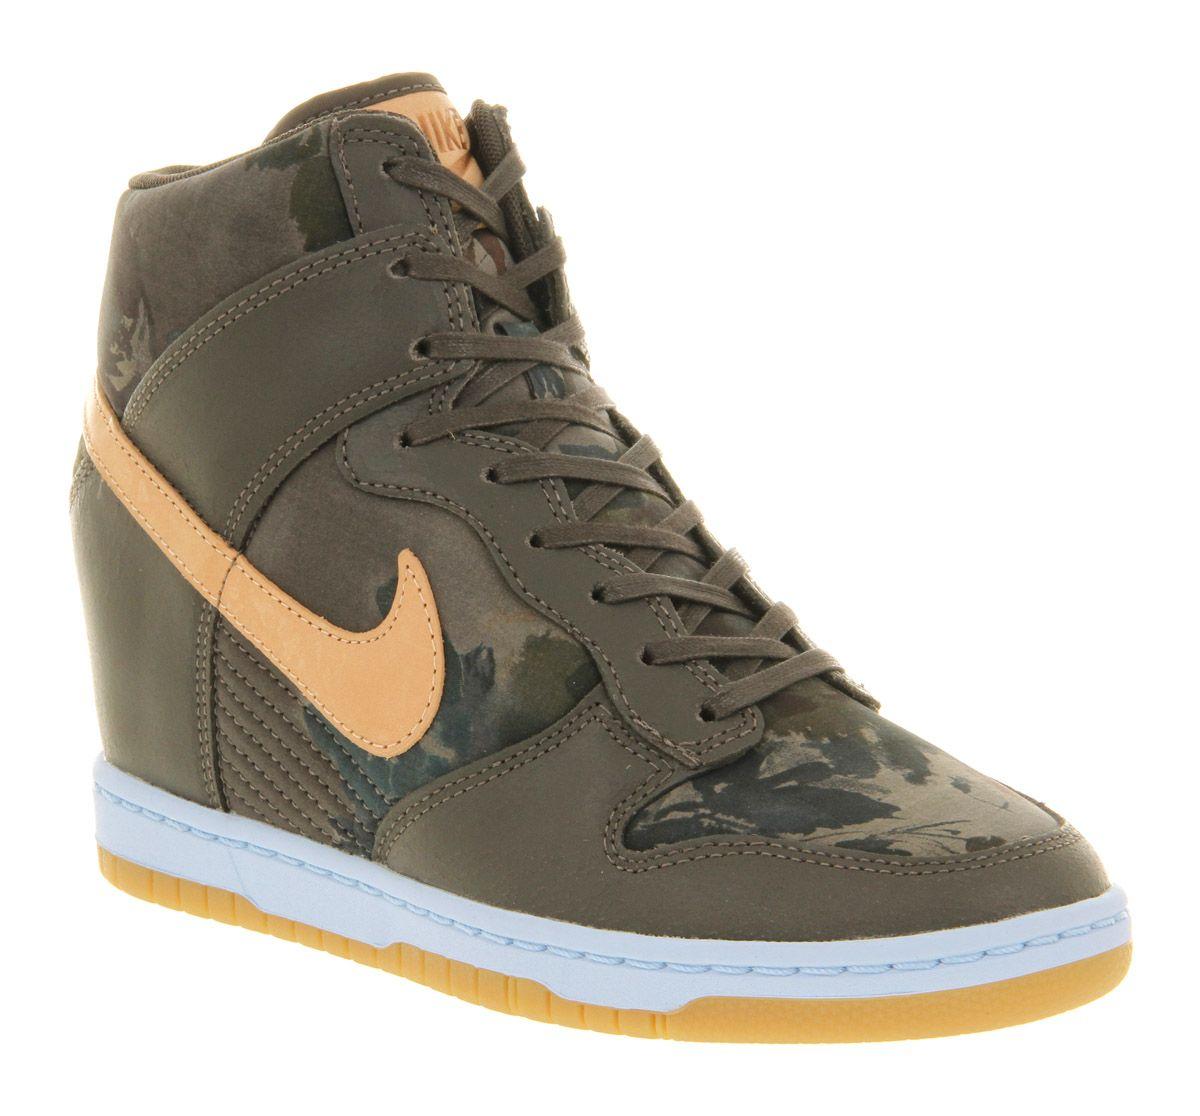 Womens Nike Dunk Sky Hi Liberty Camo Green Floral Trainers Shoes